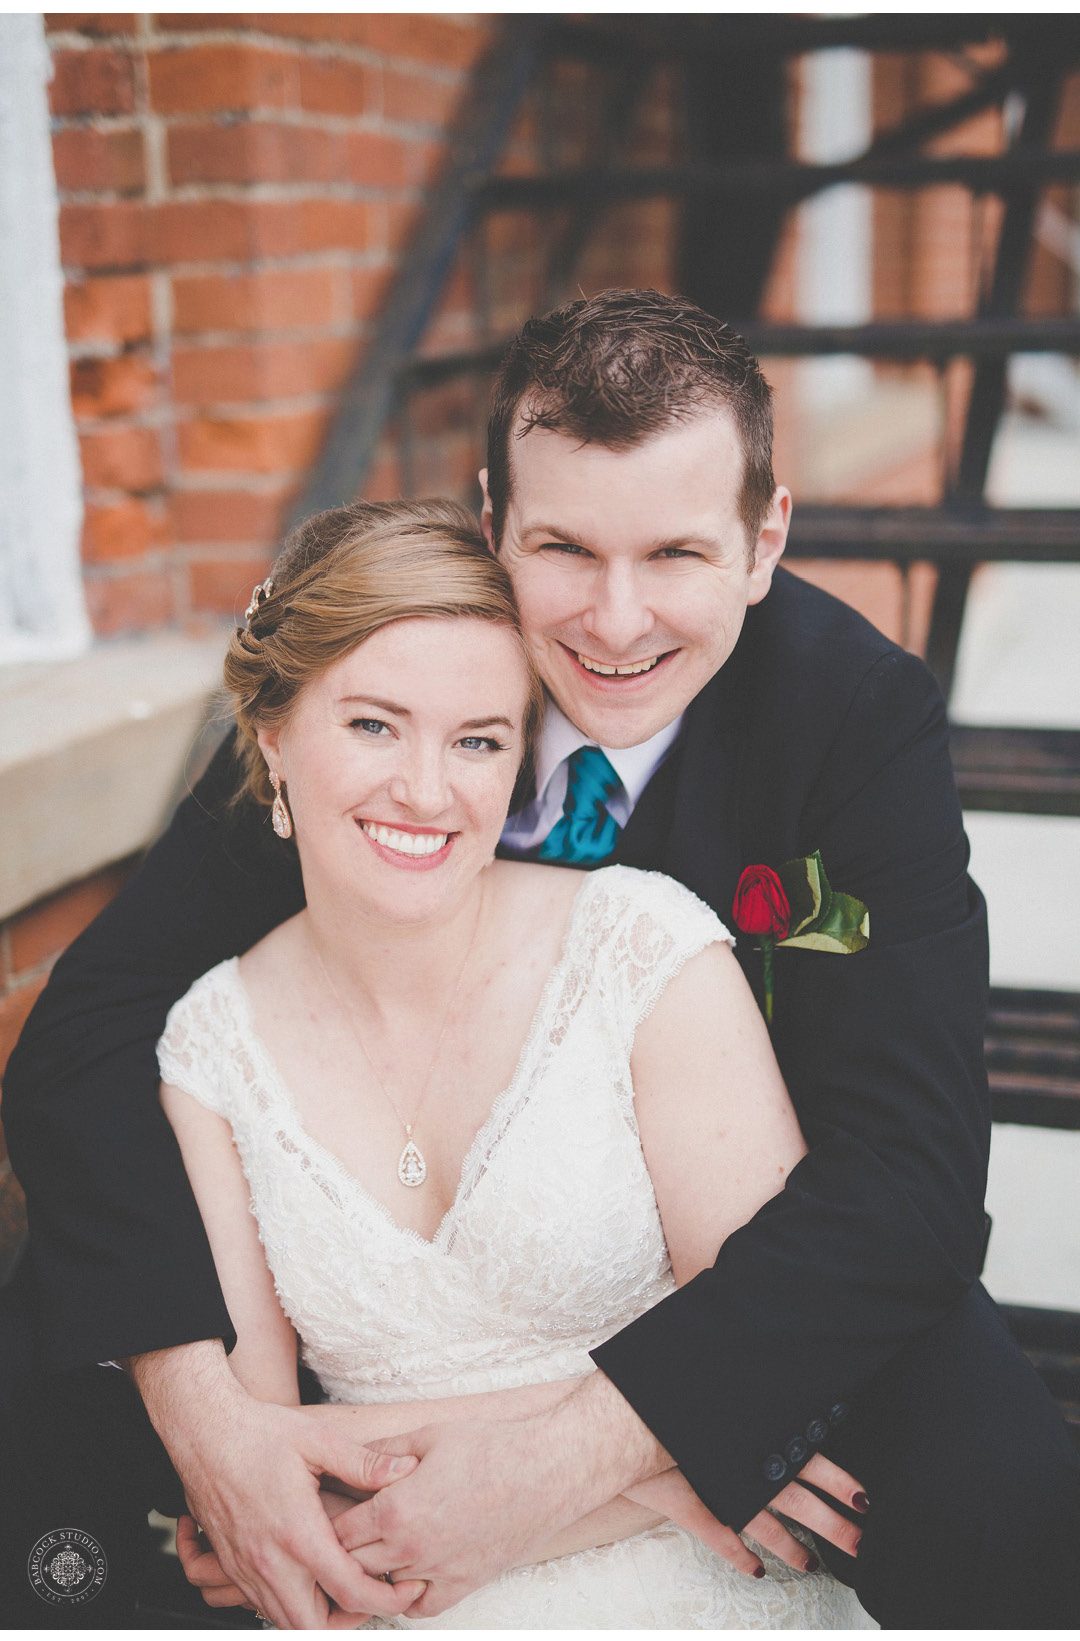 trixie-bryan-wedding-photographer-cedarville-ohio-26.jpg